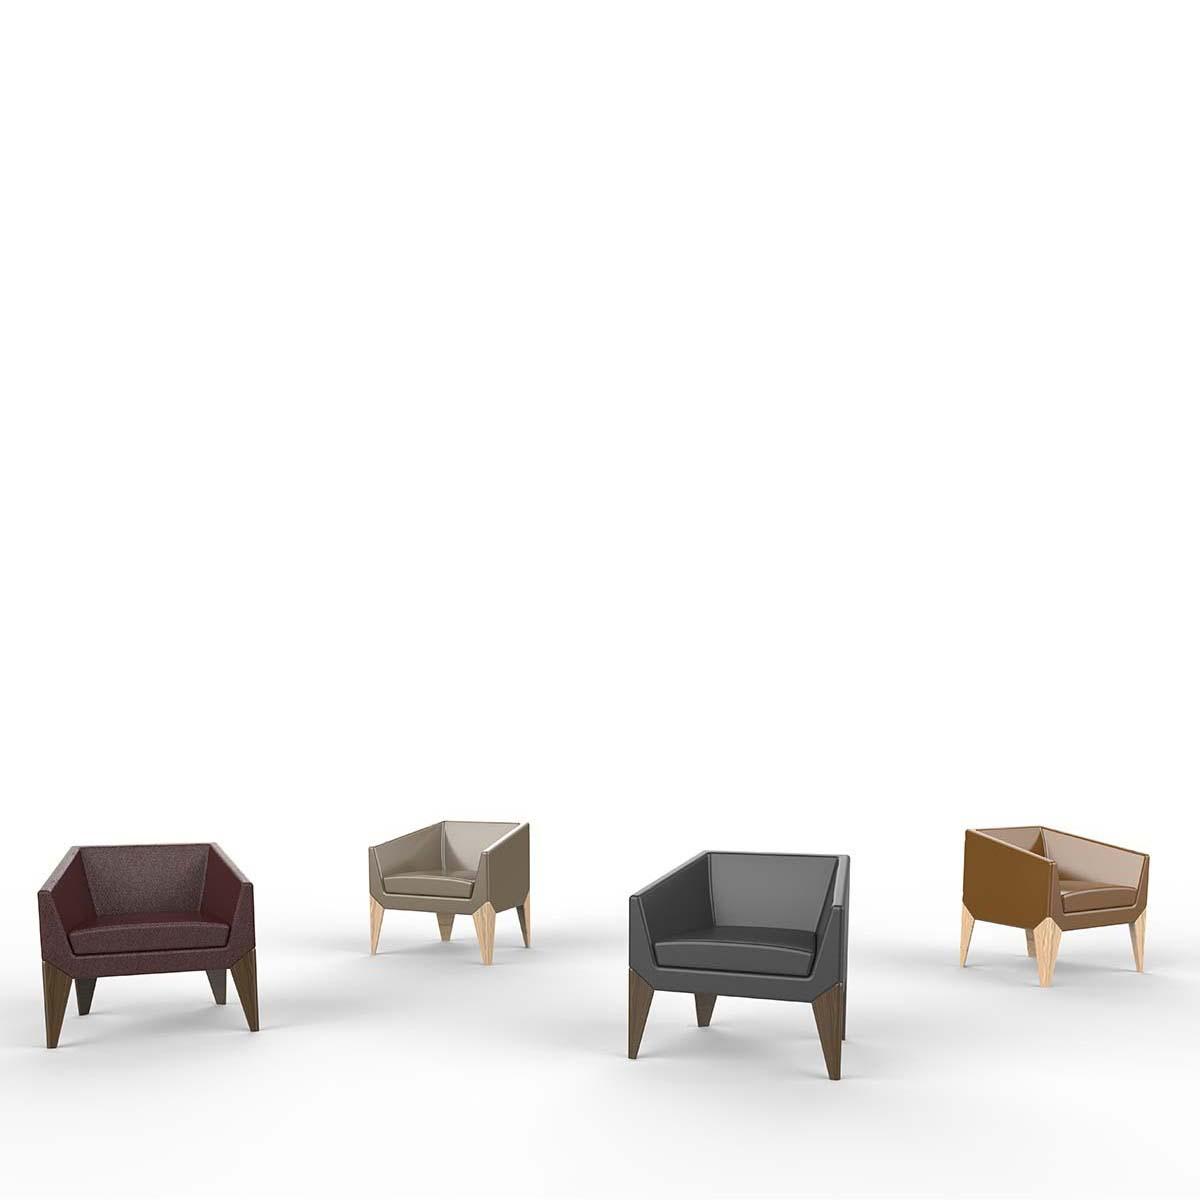 Simple form简构沙发_办公沙发图片